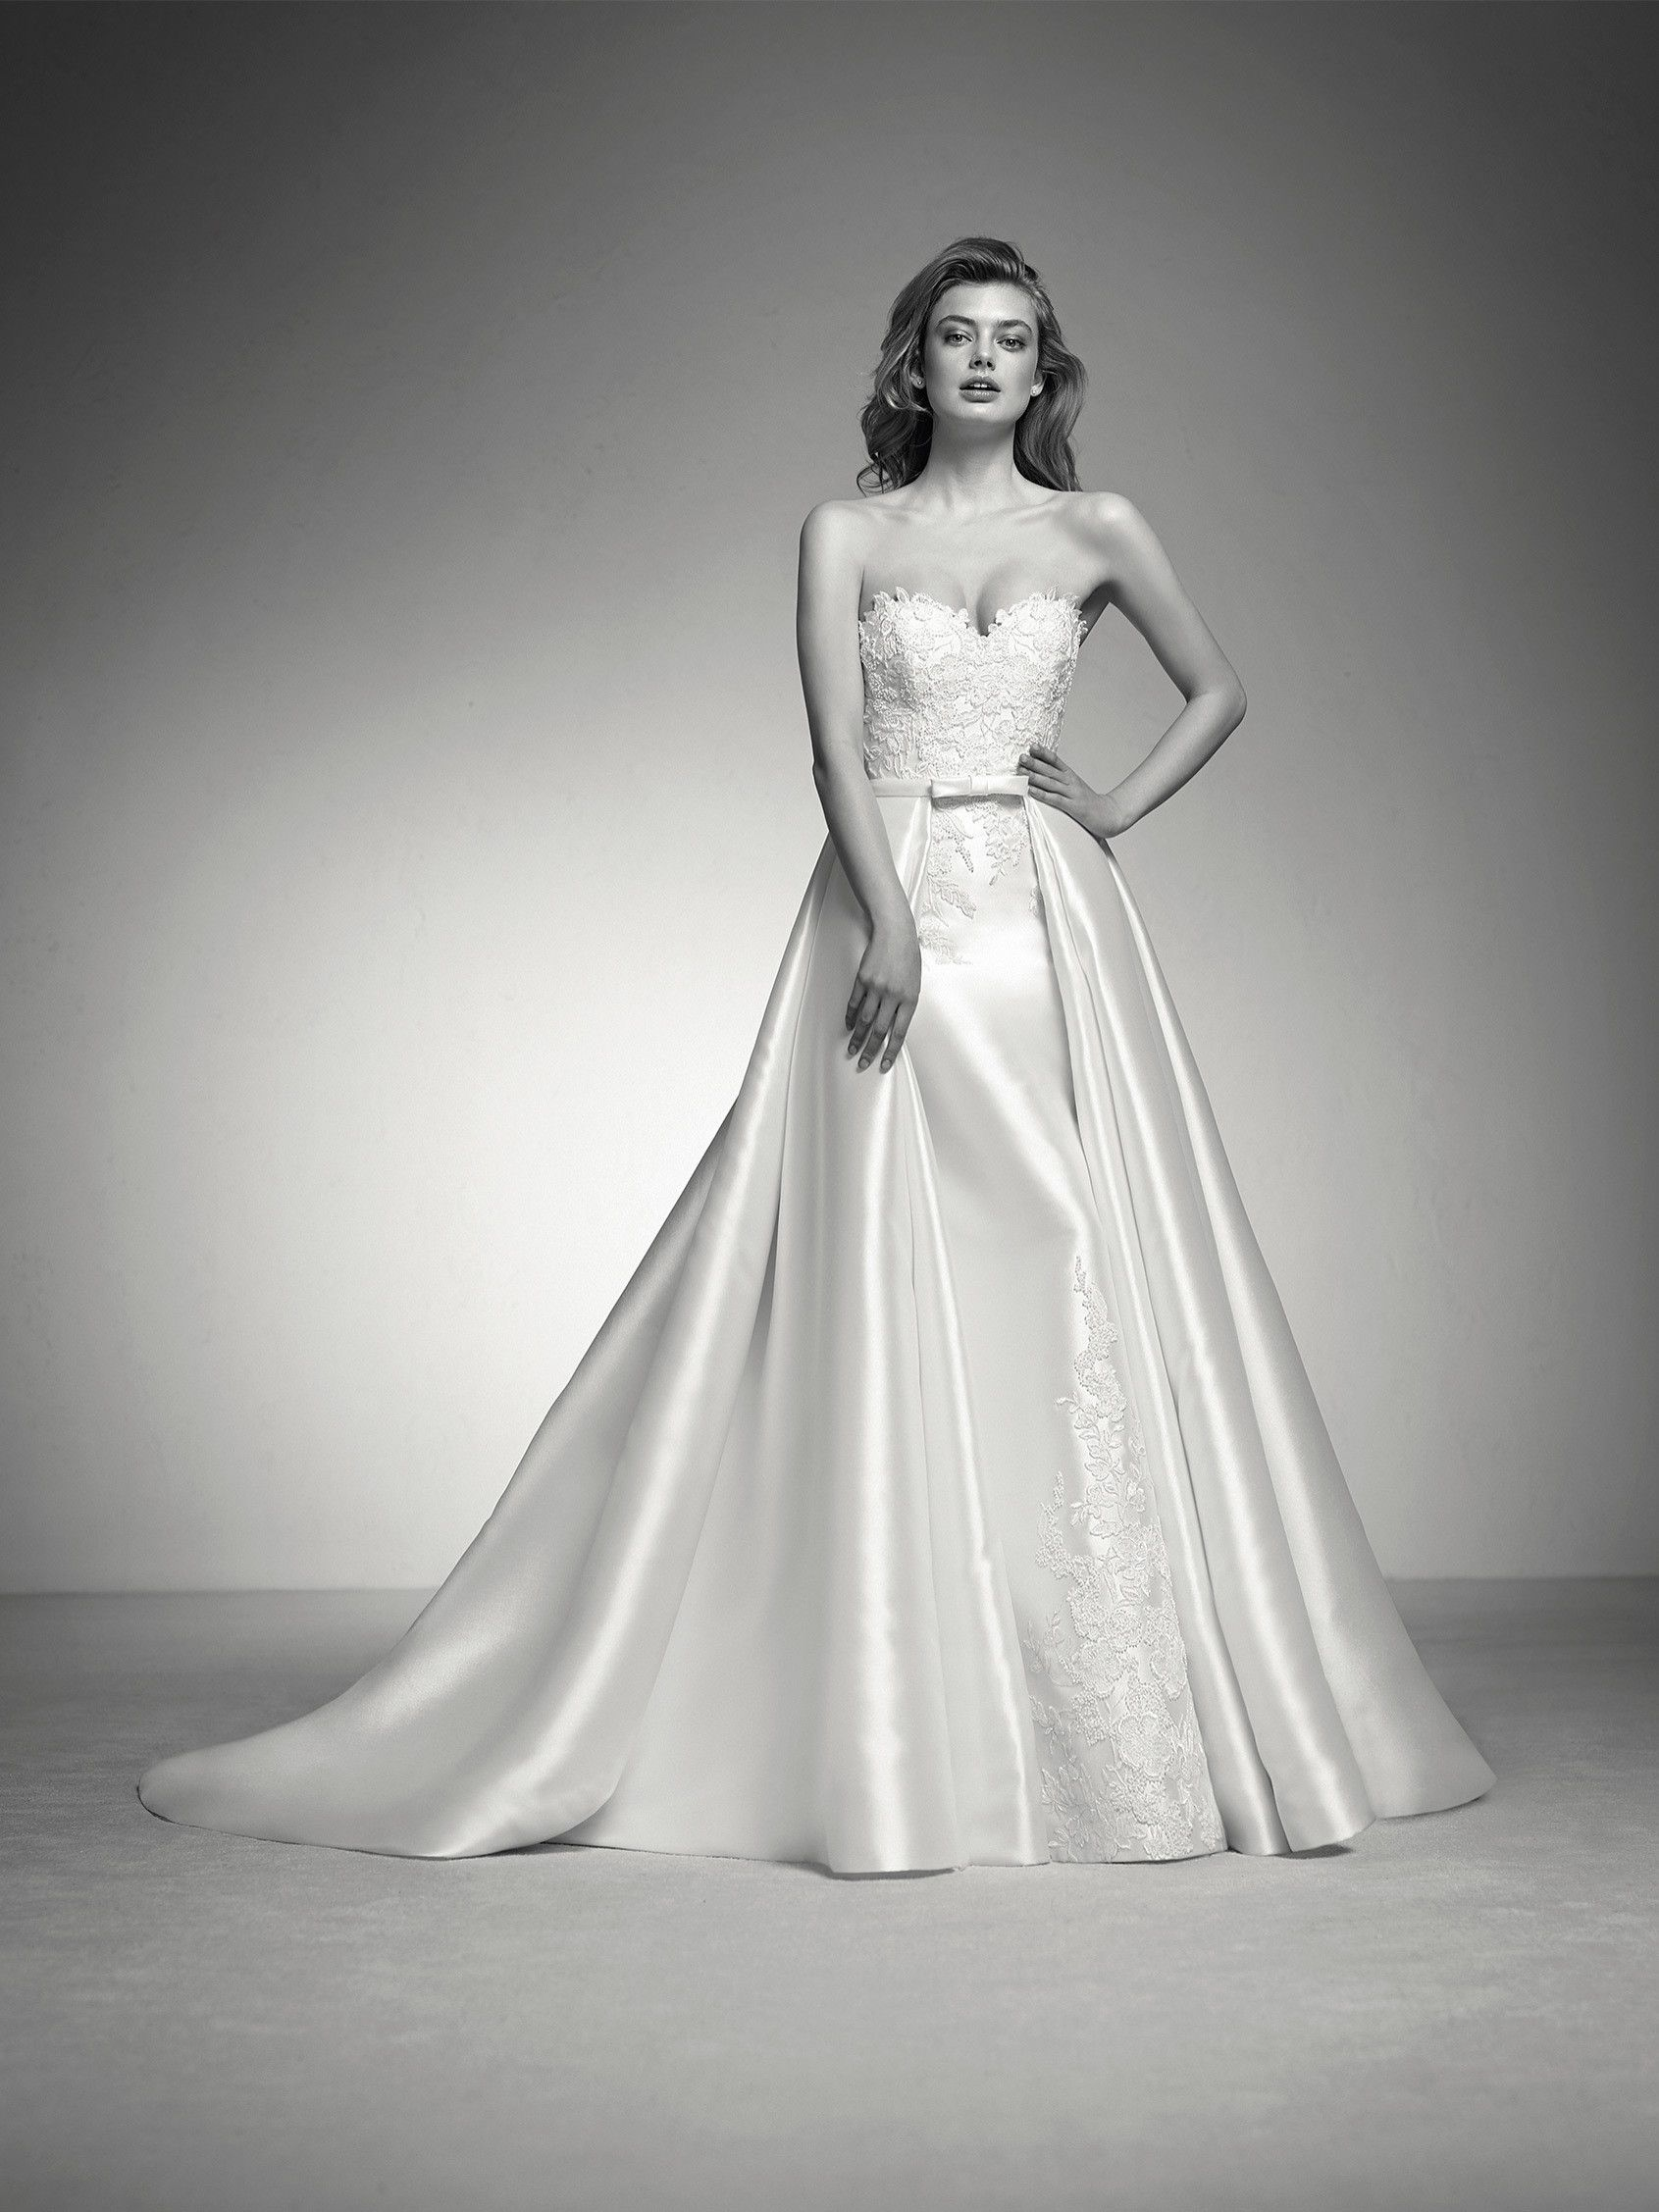 Brautkleid abnehmbarer Rock | Wedding Dresses | Pinterest ...